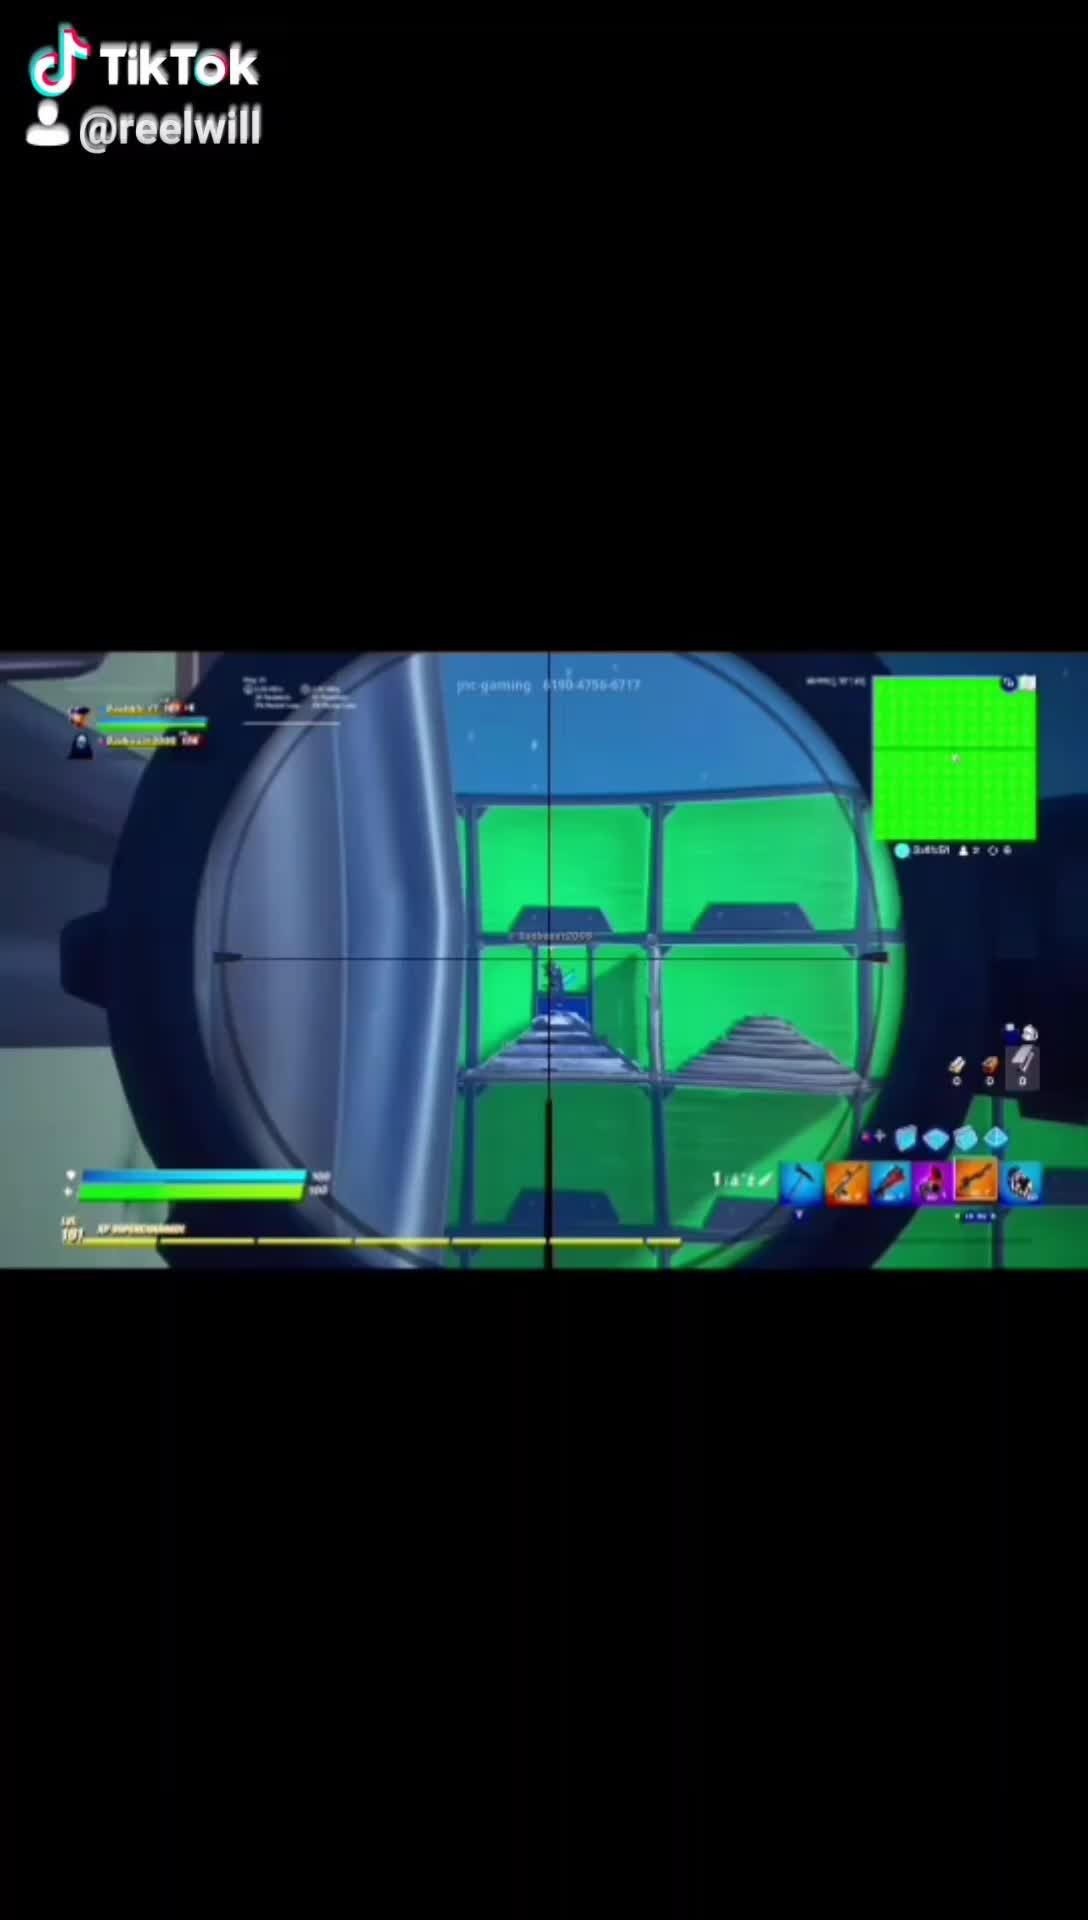 Fortnite: General - Sniper Montage video cover image 0